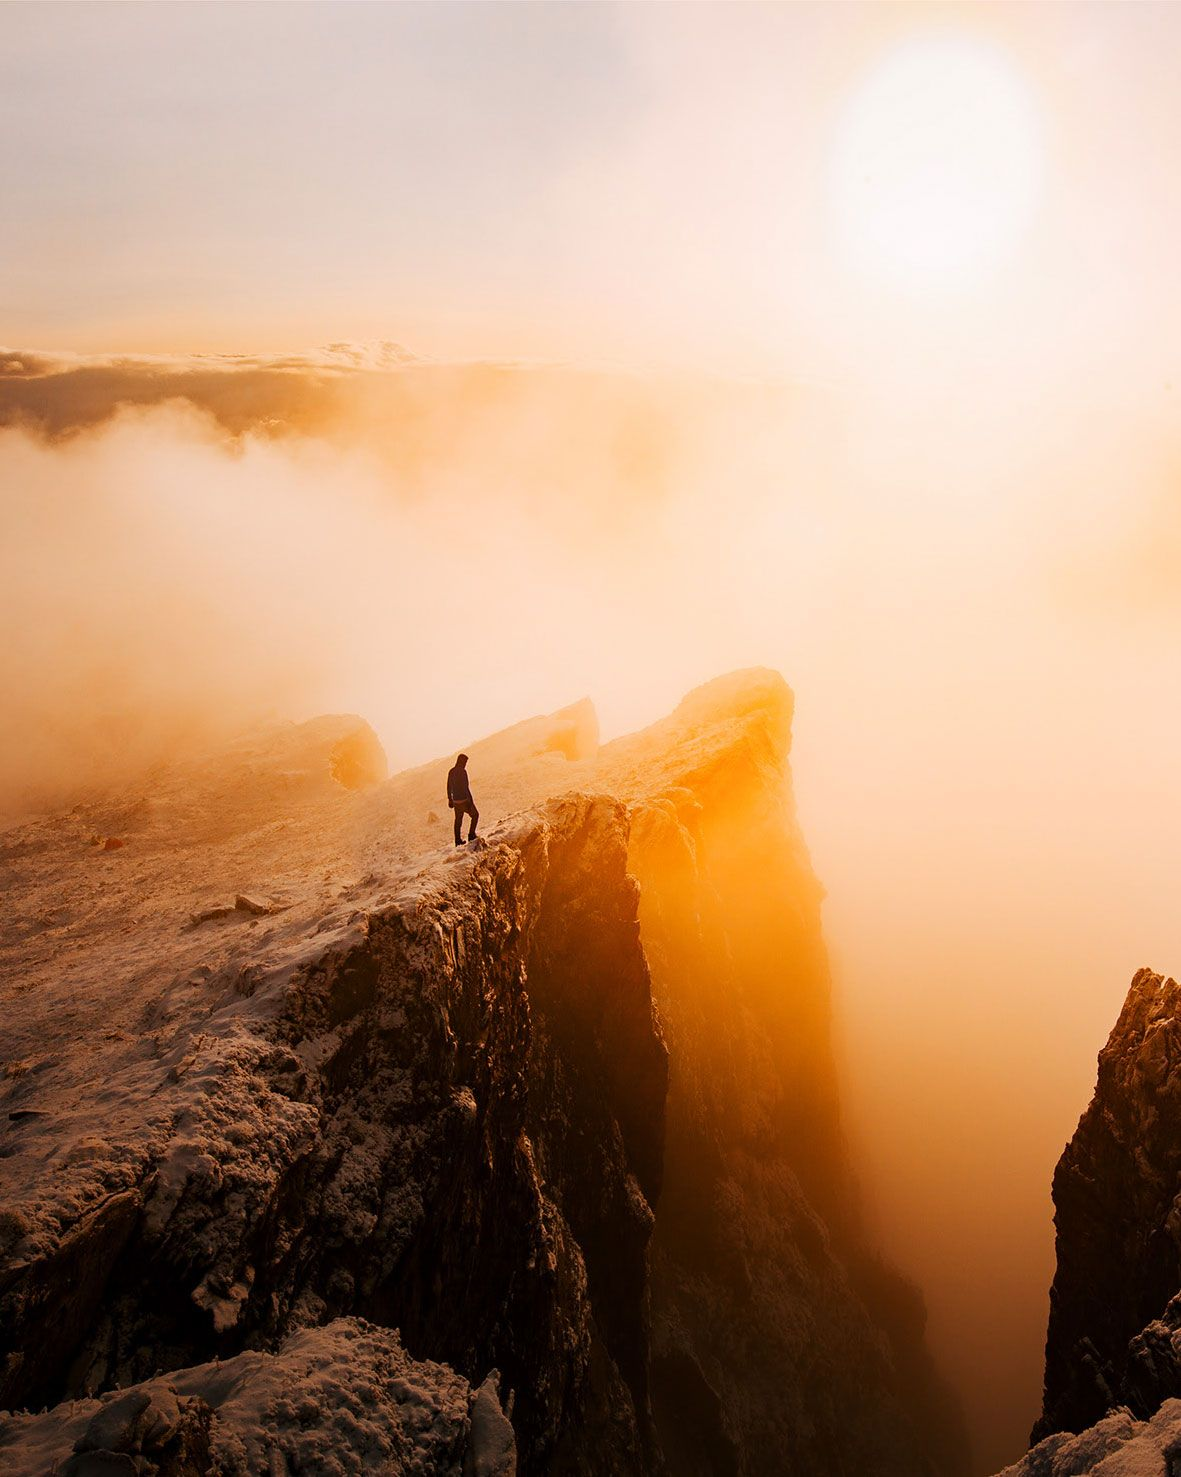 Sunrise at Piz Fess, Lopentine Alps, by Florian Wenzel.